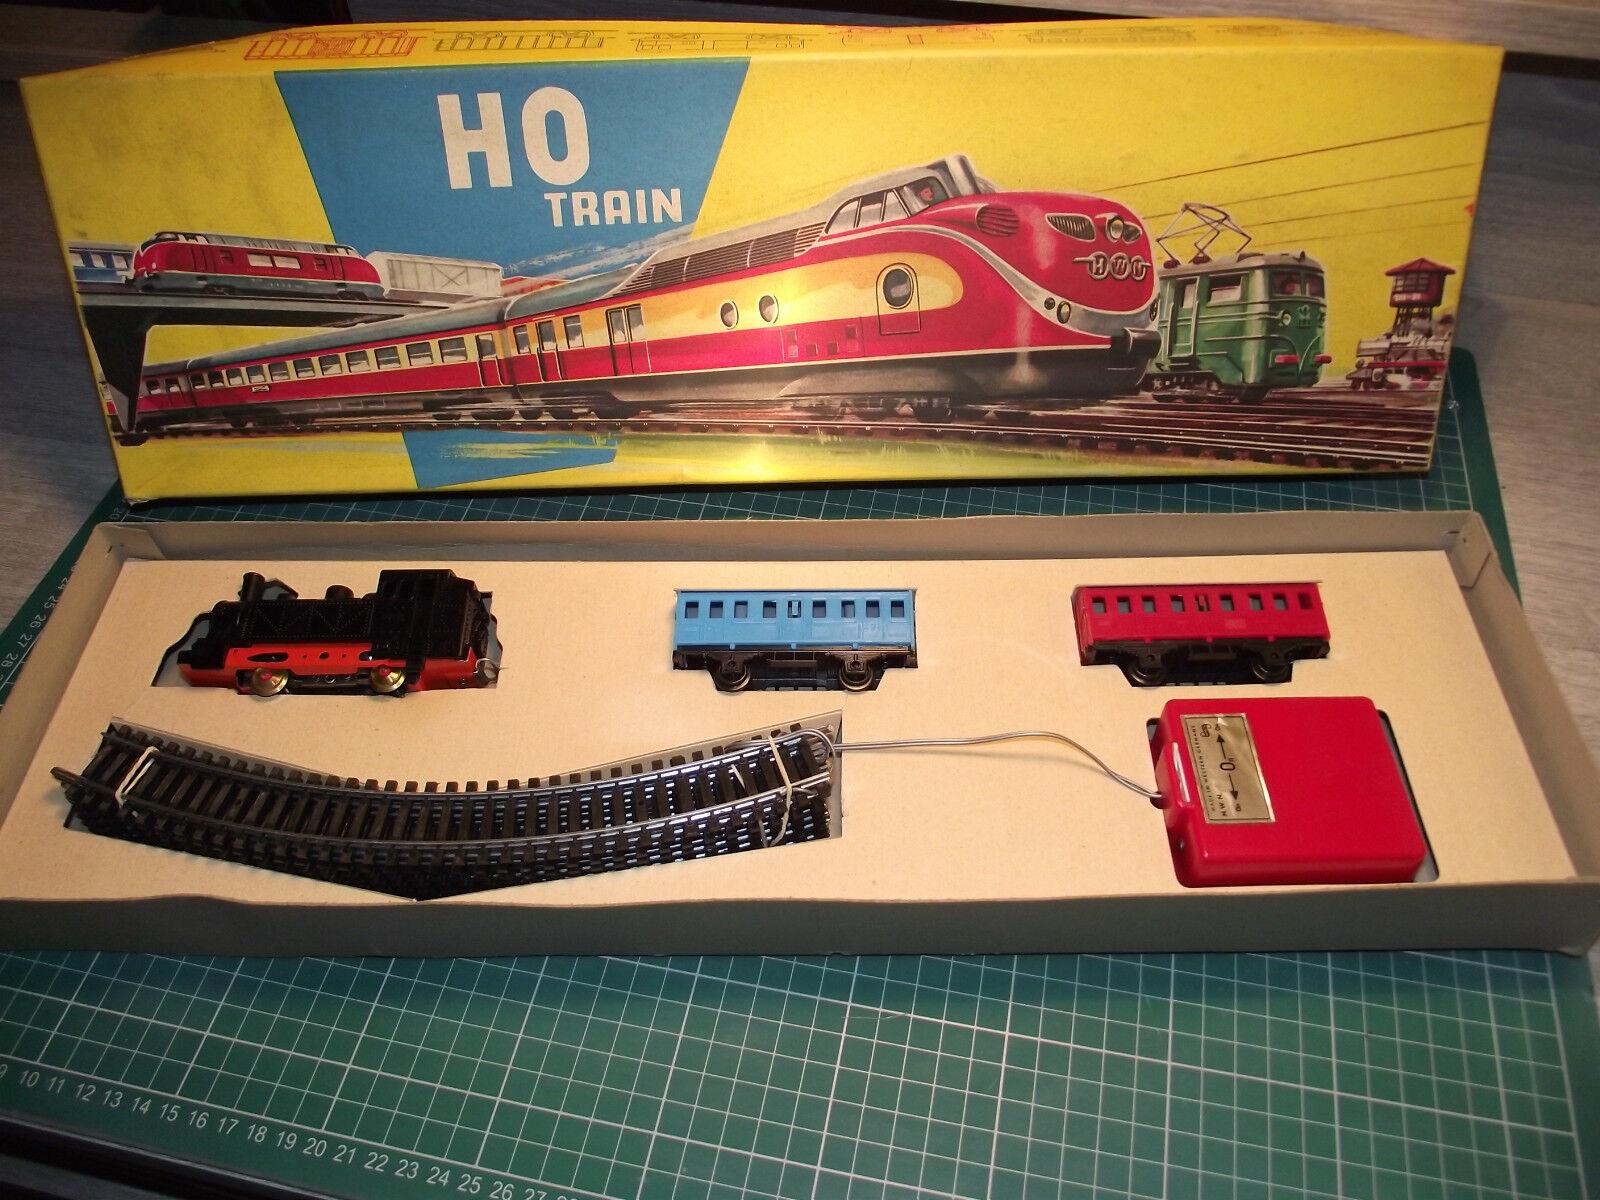 T E E -TRANS-EUROP-EXPRESS - Spielzeugeisenbahn Toy train-H V N-Western Germany